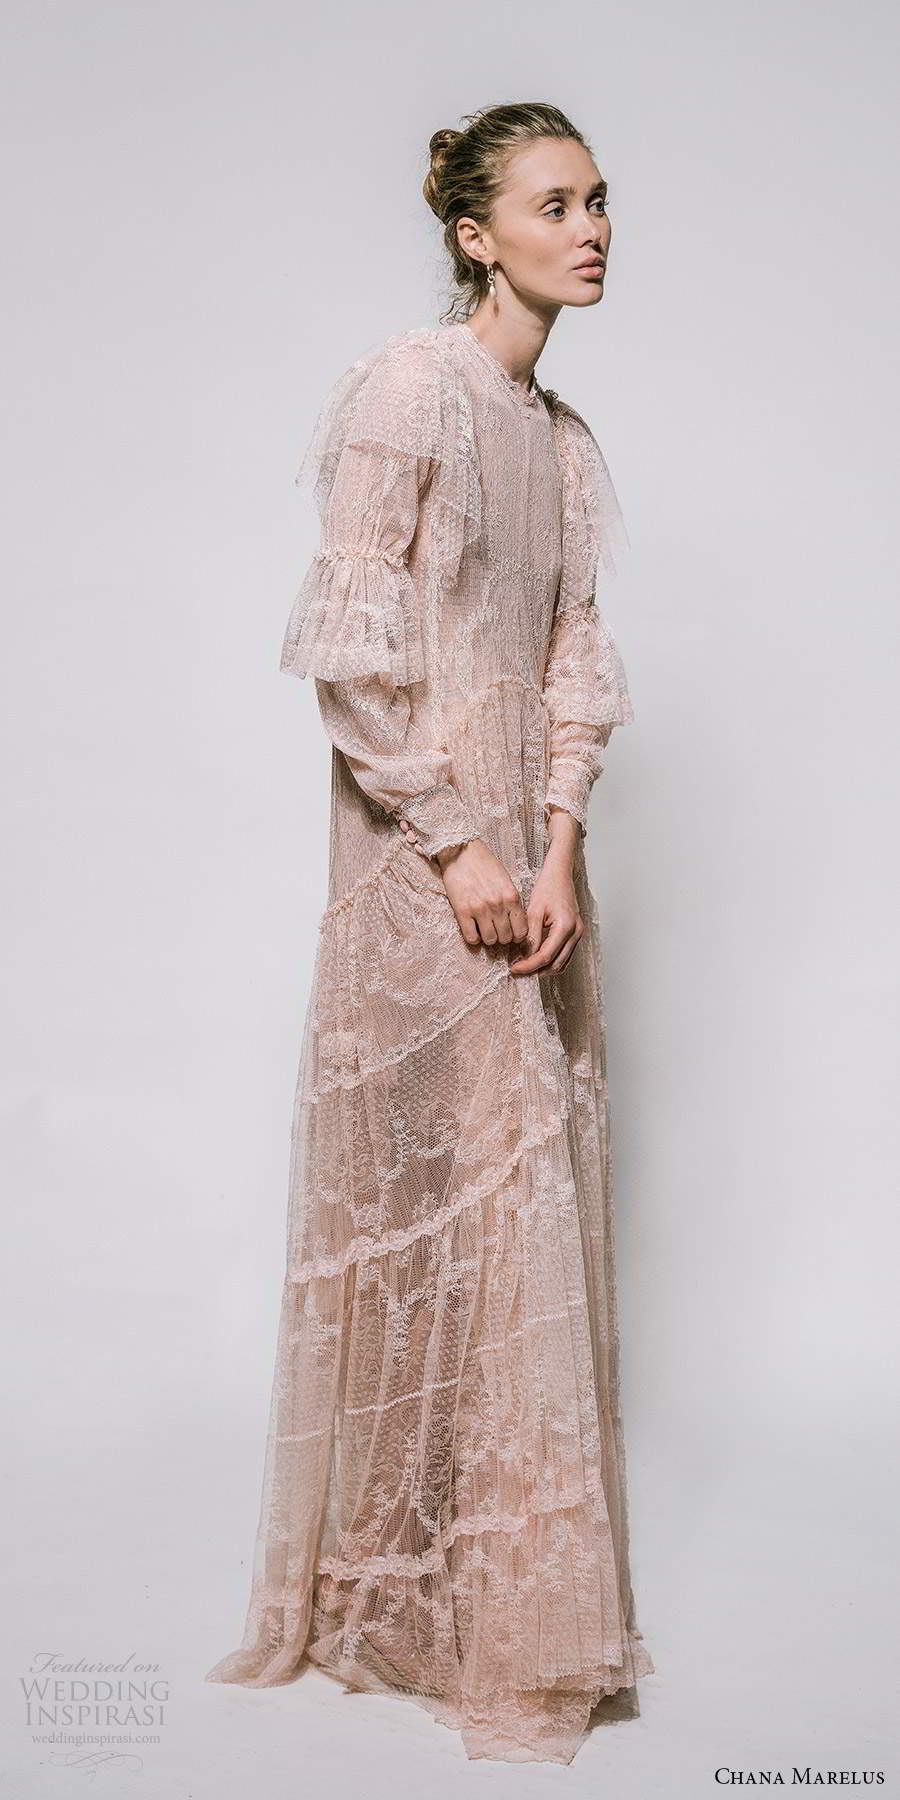 chana marelus 2021 bridal long sleeves jewel neckline embellished dotted tulle column wedding dress blush pink (11) mv